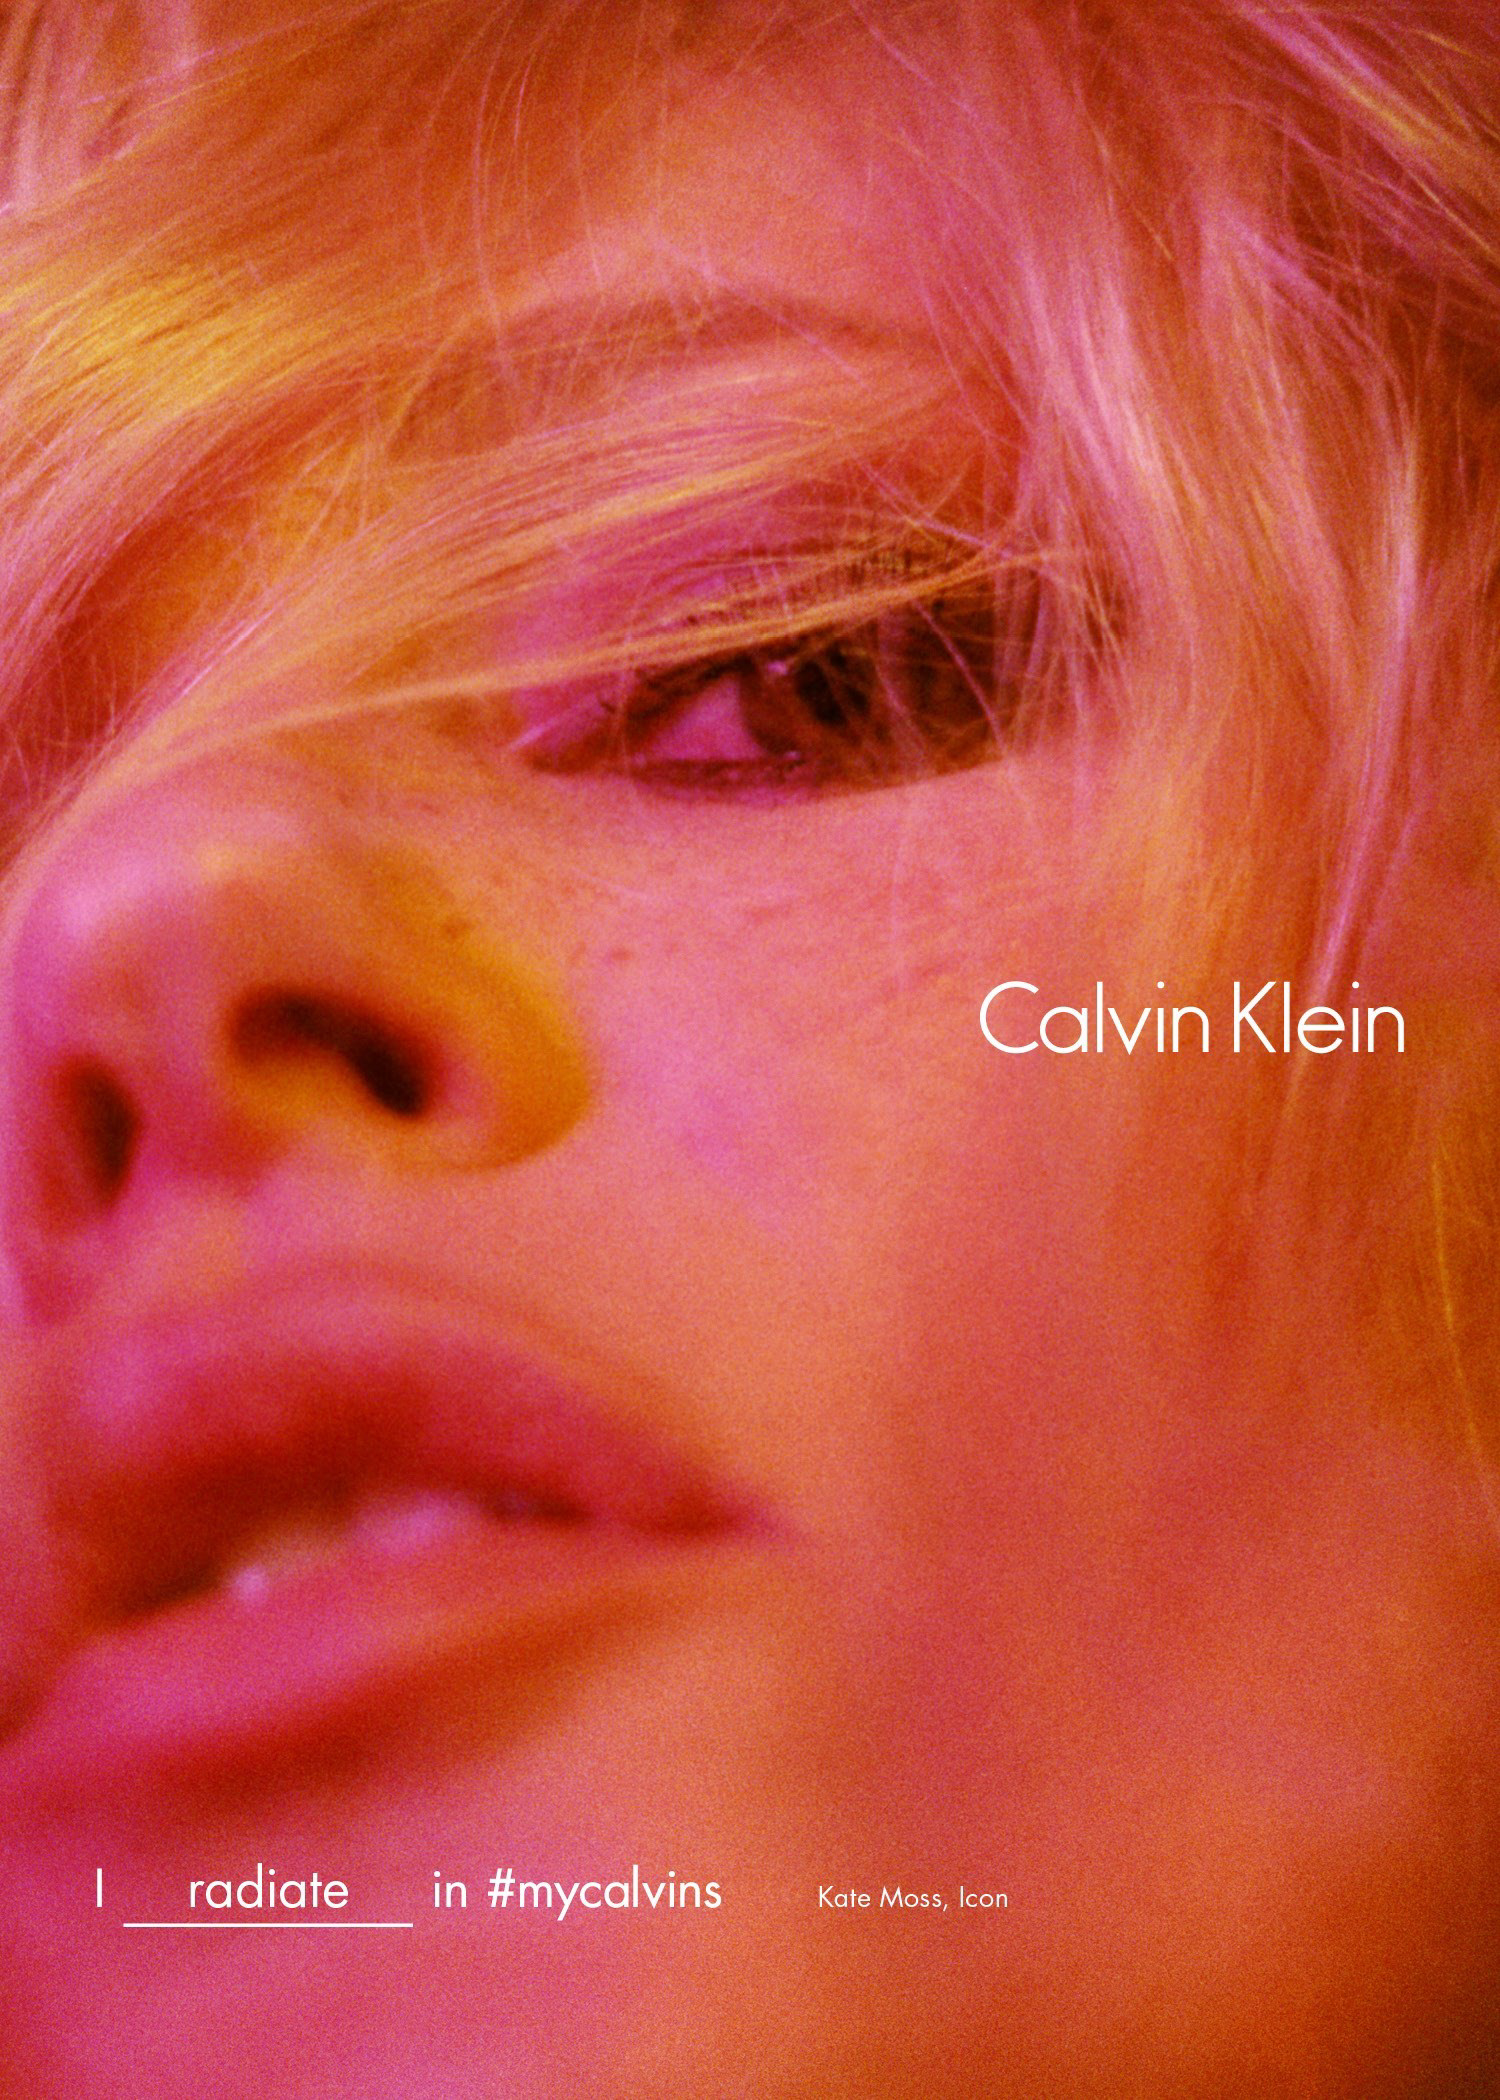 so-it-goes-calvin-klein-aw16-campaign-7.jpg